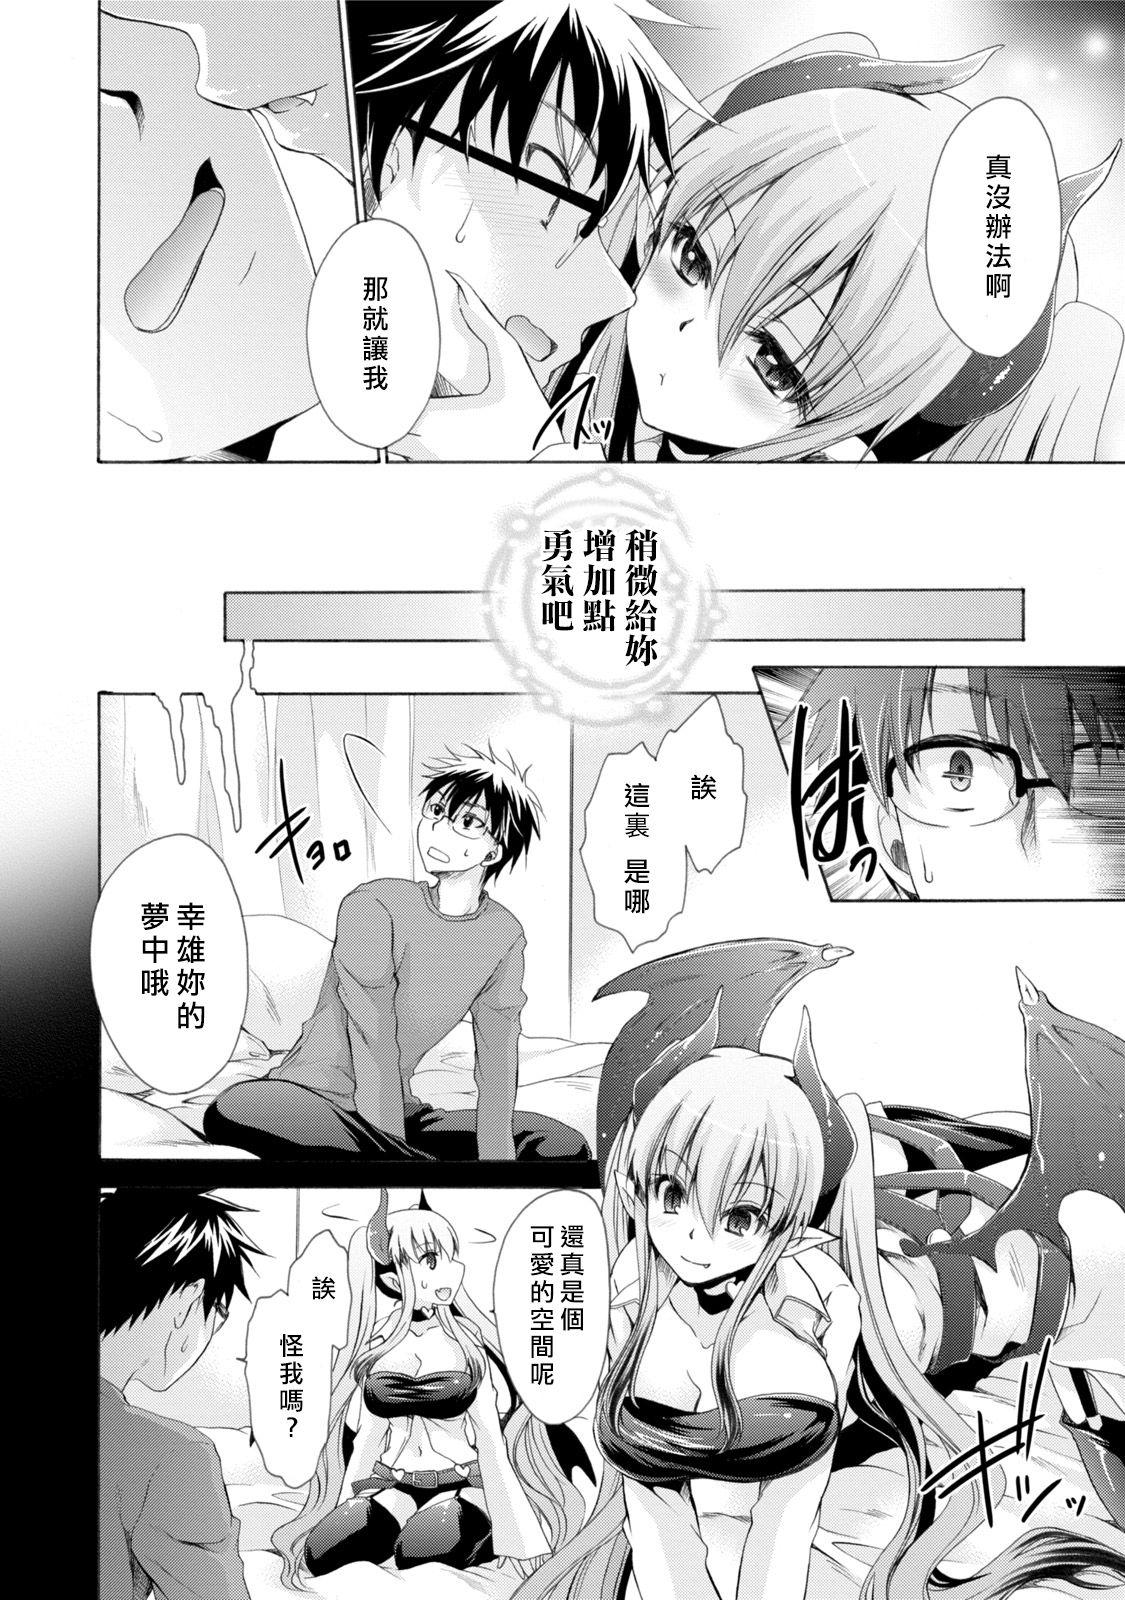 [Shinonome Ryu] Ore to Kanojo to Owaru Sekai - World's end LoveStory 1-5 [Chinese] [爱弹幕汉化组] [Digital] 13